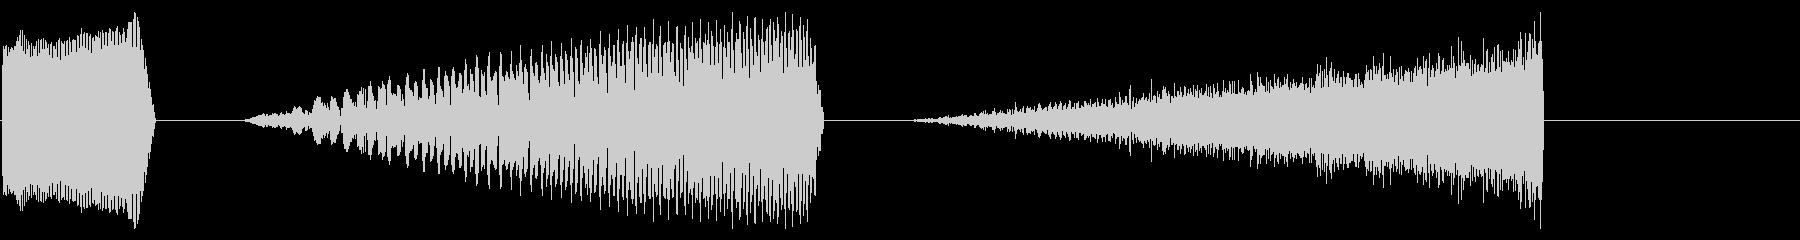 X3をパワーアップするの未再生の波形